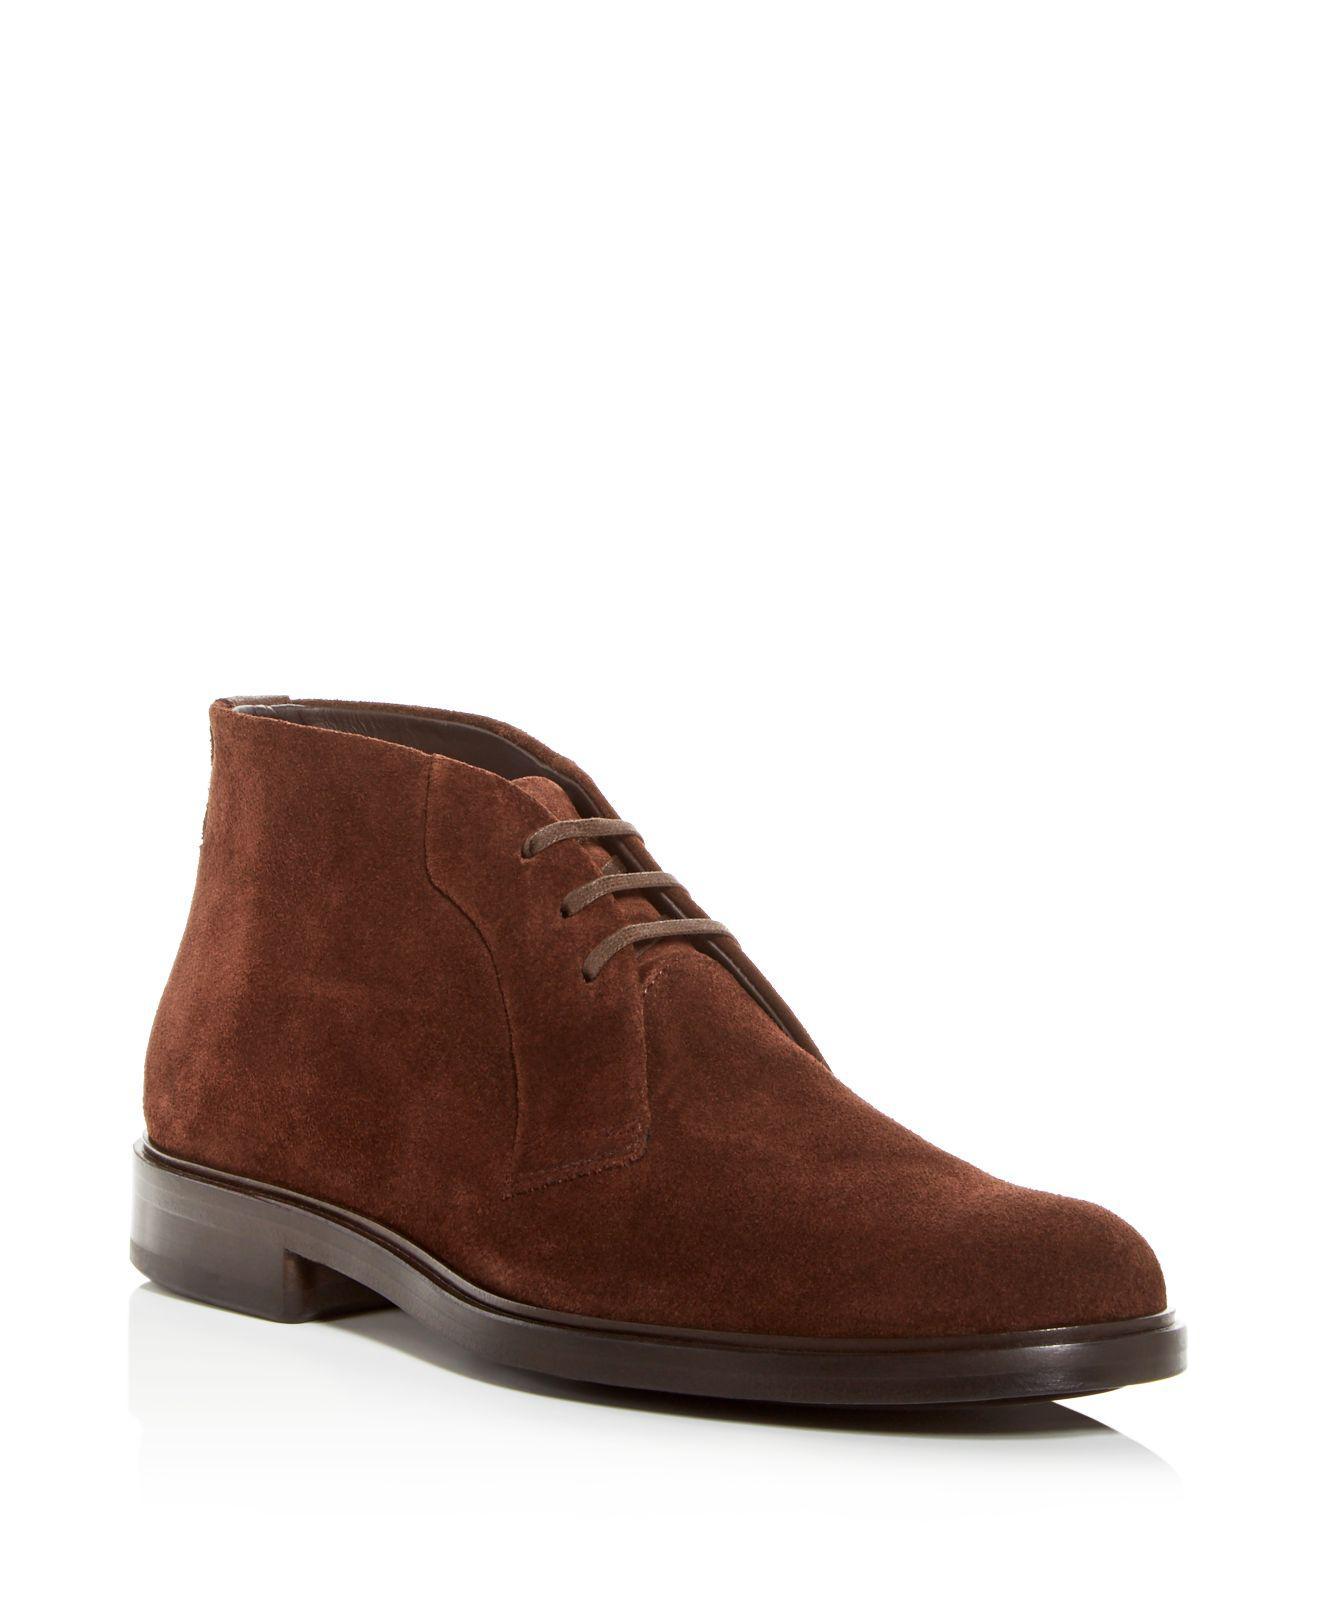 Vince Men's Brunswick Suede Chukka Boots PJtI8